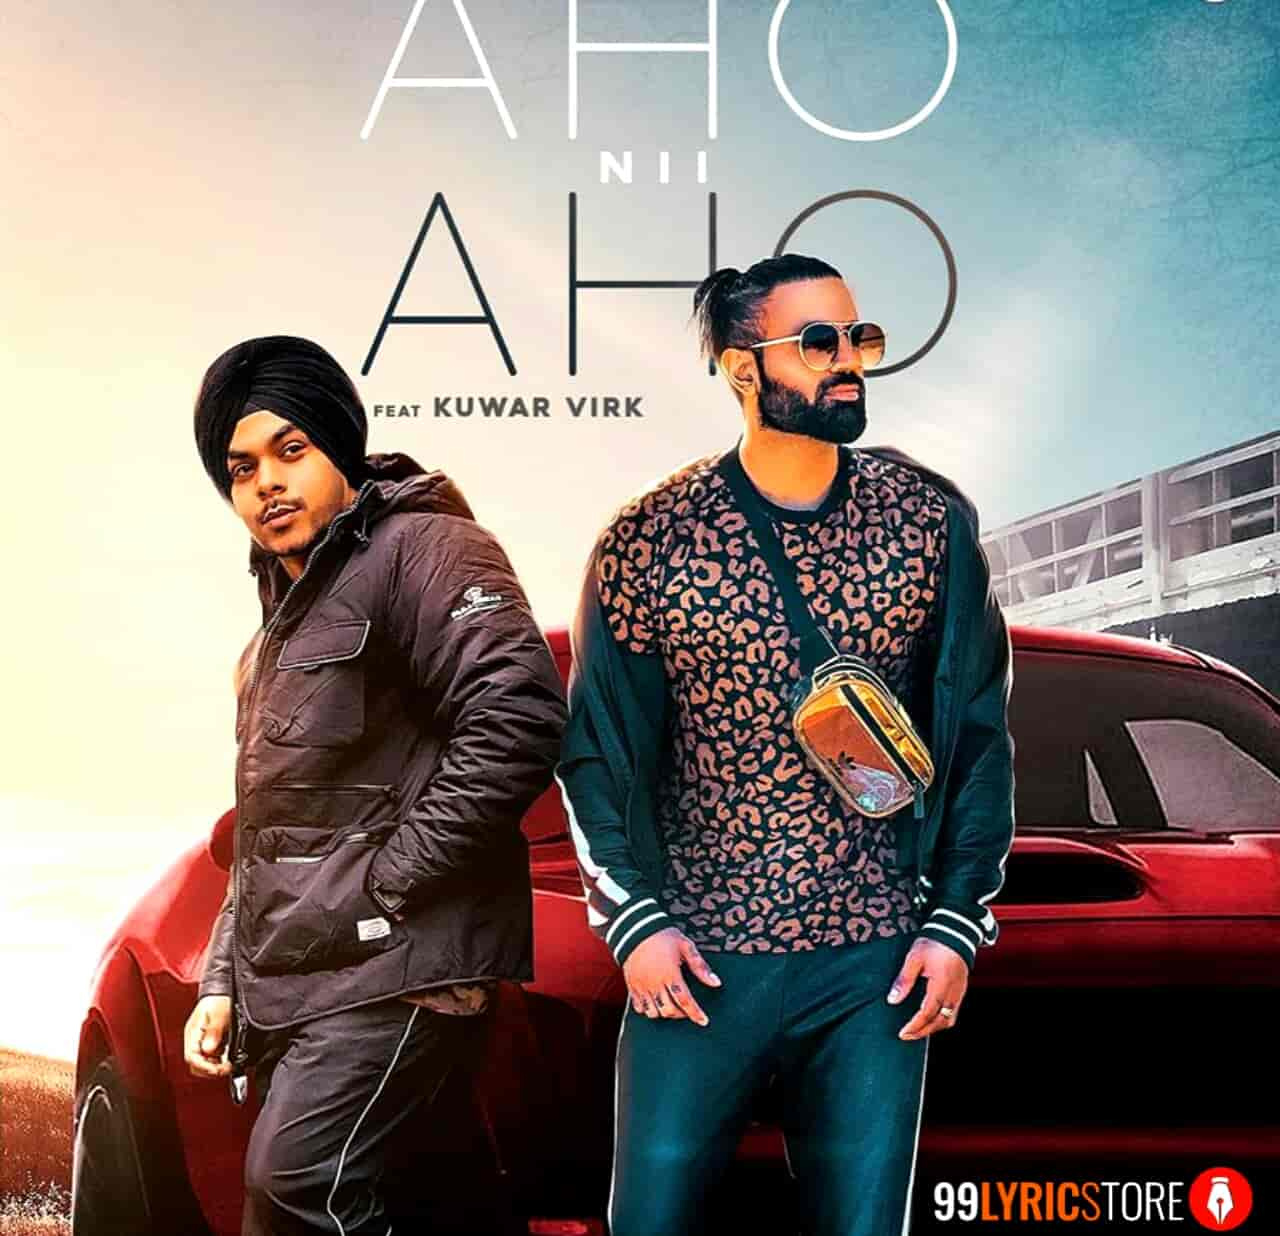 Aho Nii Aho Song Images By Gagan Kokri and Kuwar Virk